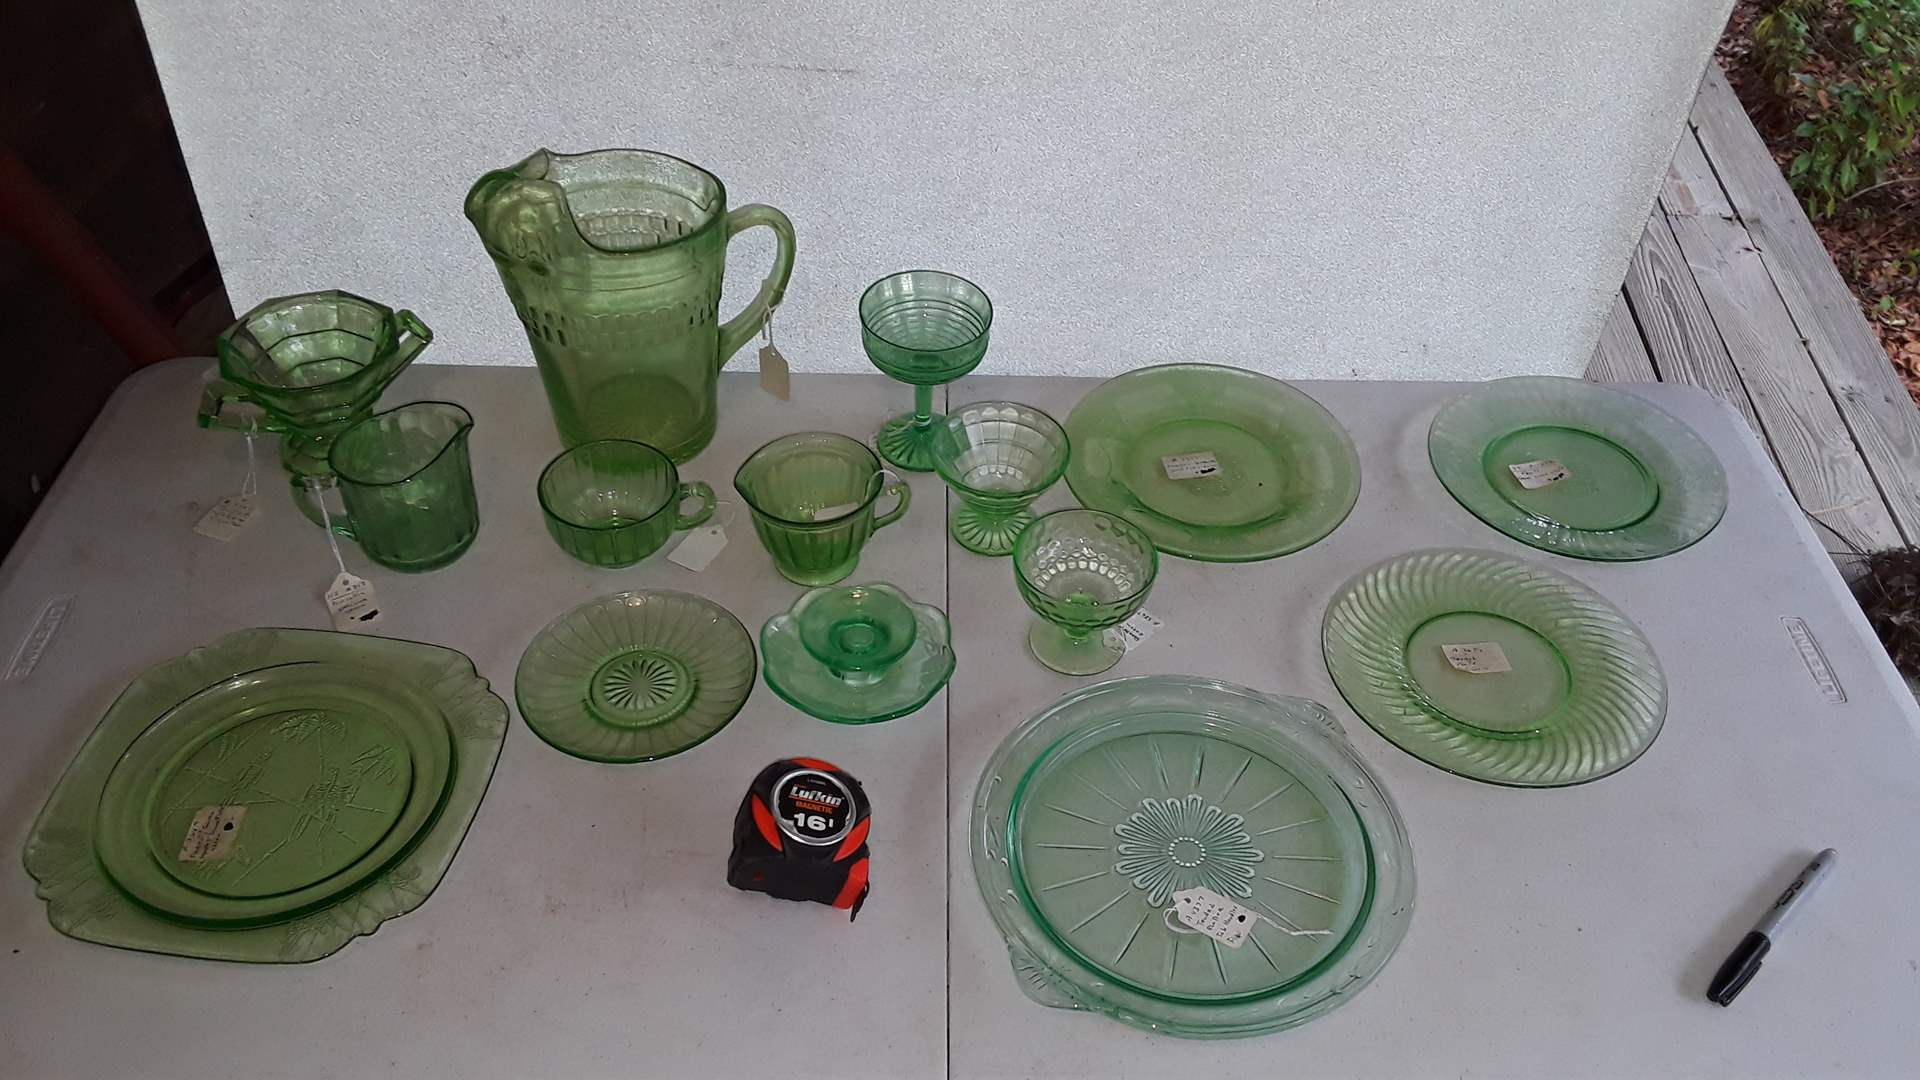 Lot # 339 GREEN DEPRESSION GLASS, ROULETTE PITCHER, TENDRIL PLATTER,  GEORGIAN LOVEBIRDS, SYLVAN PARROTS